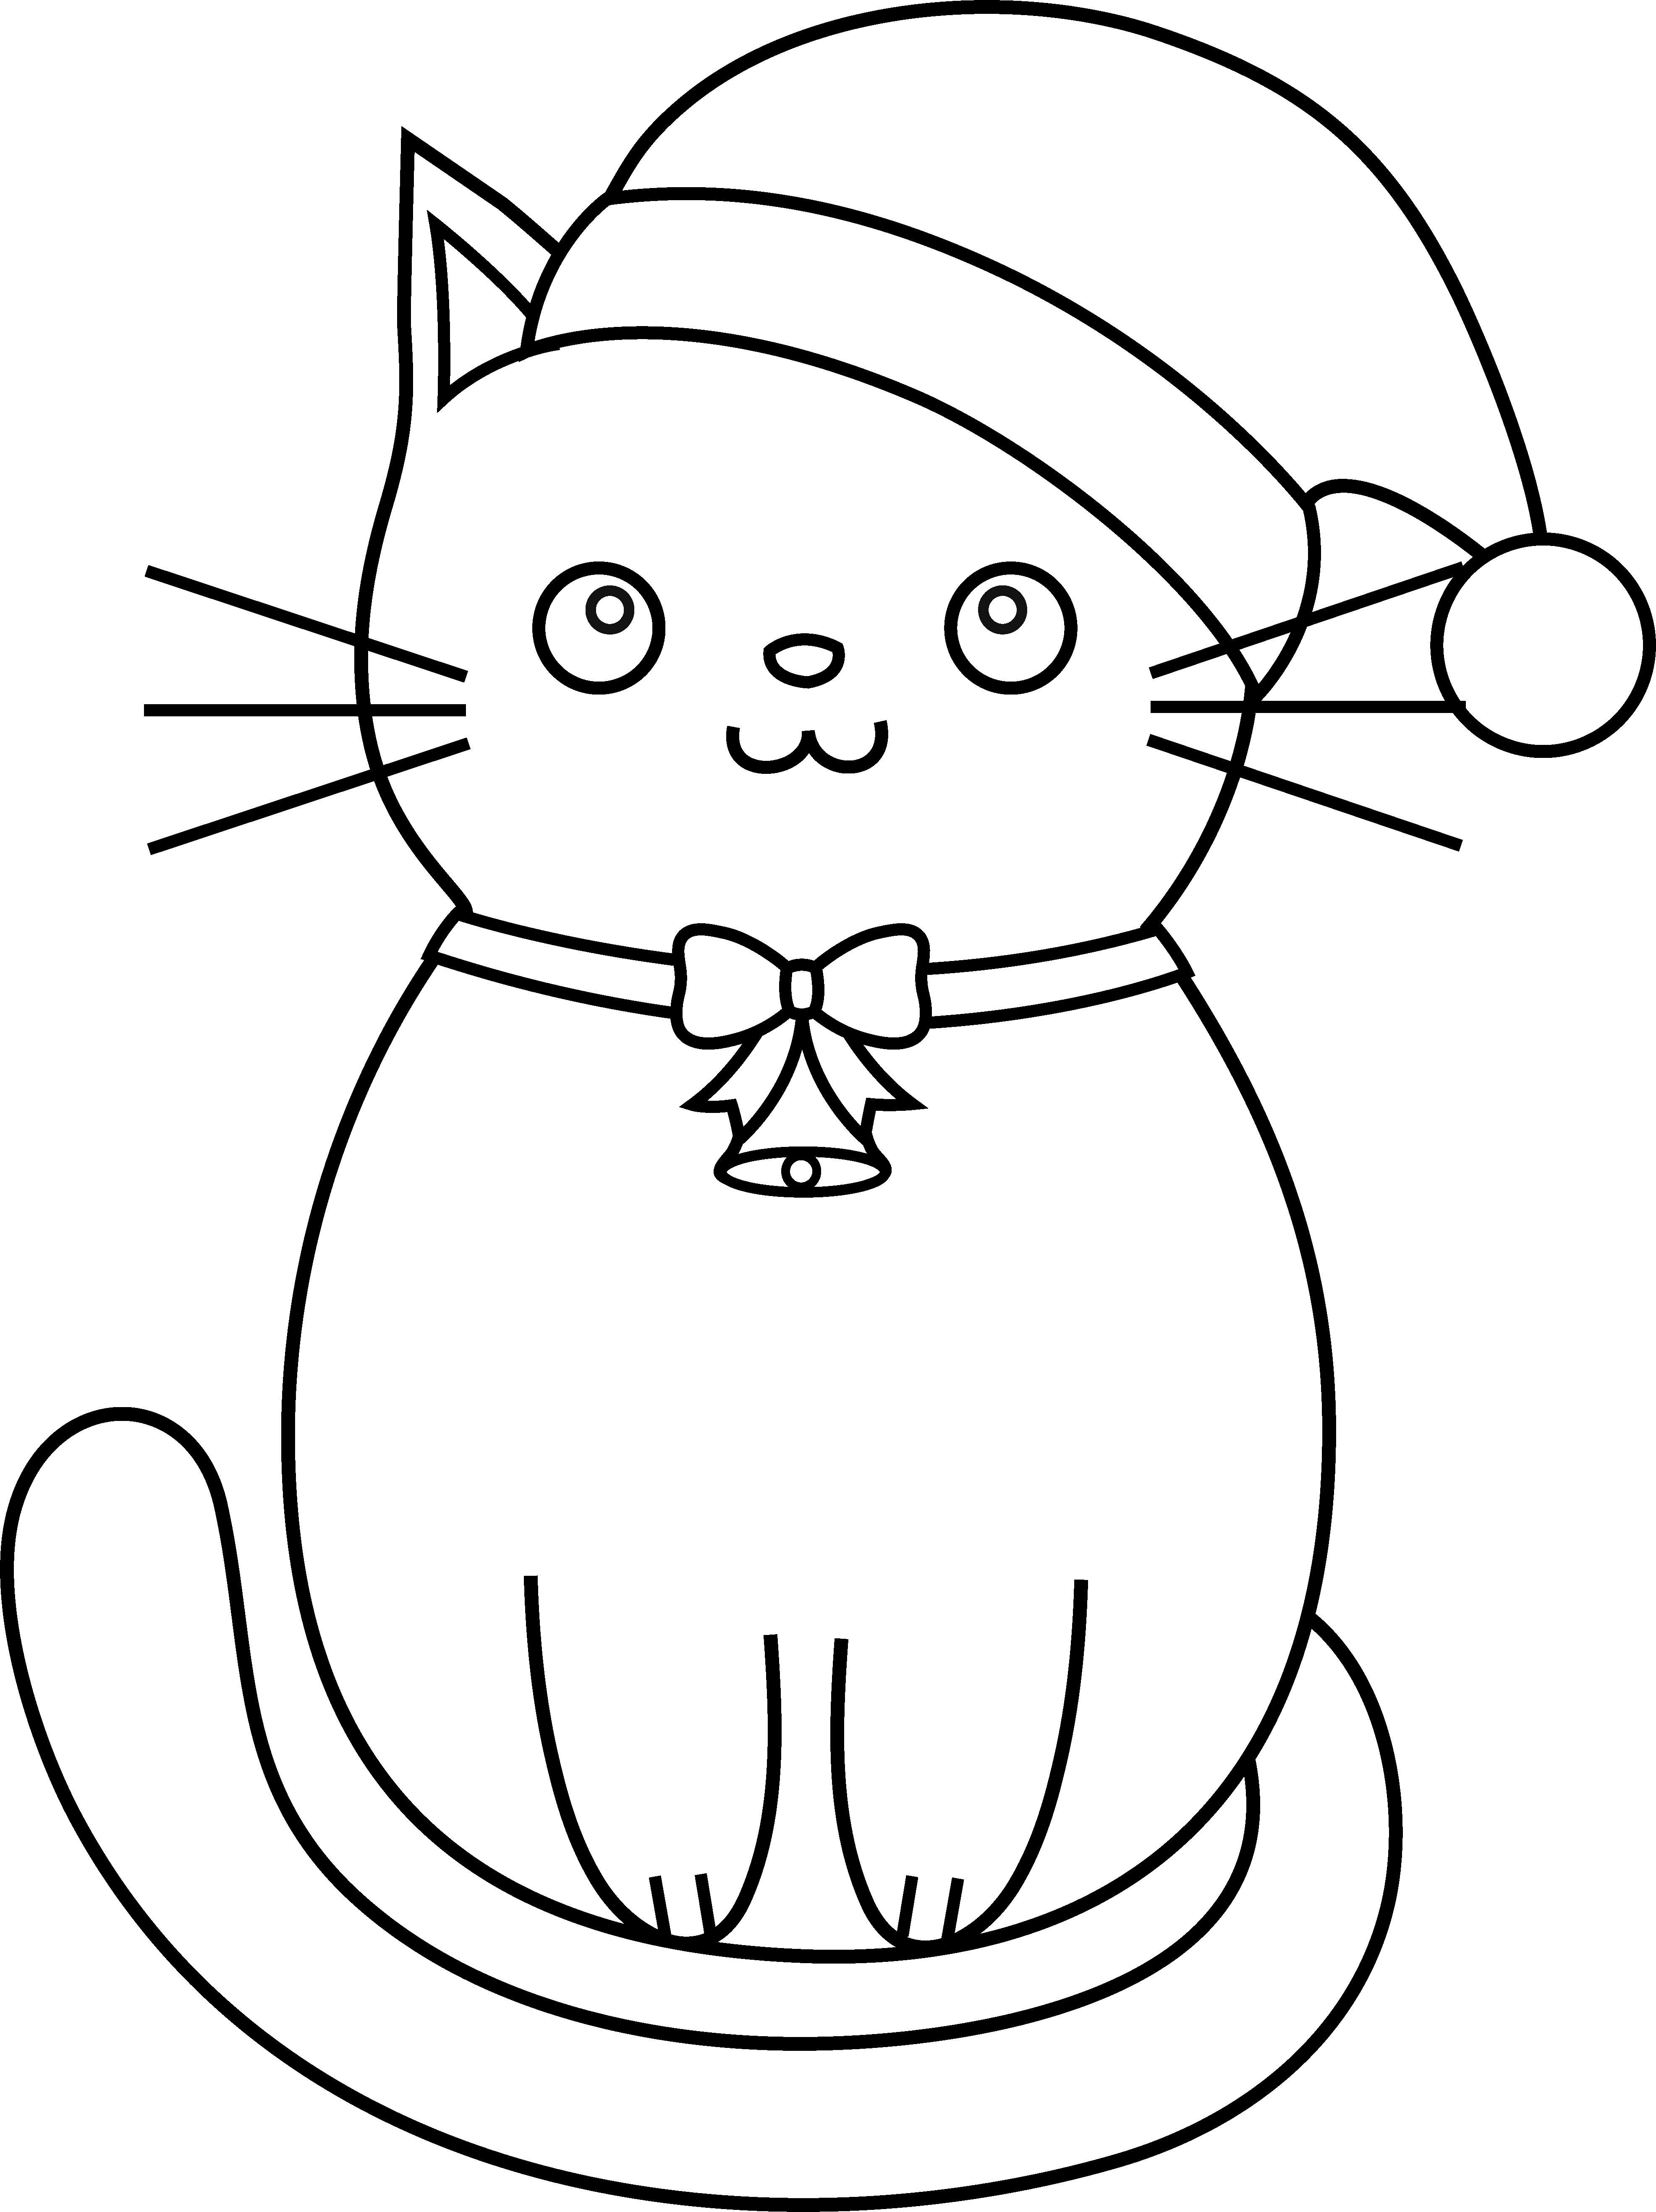 Color clipart christmas. Cat line art free